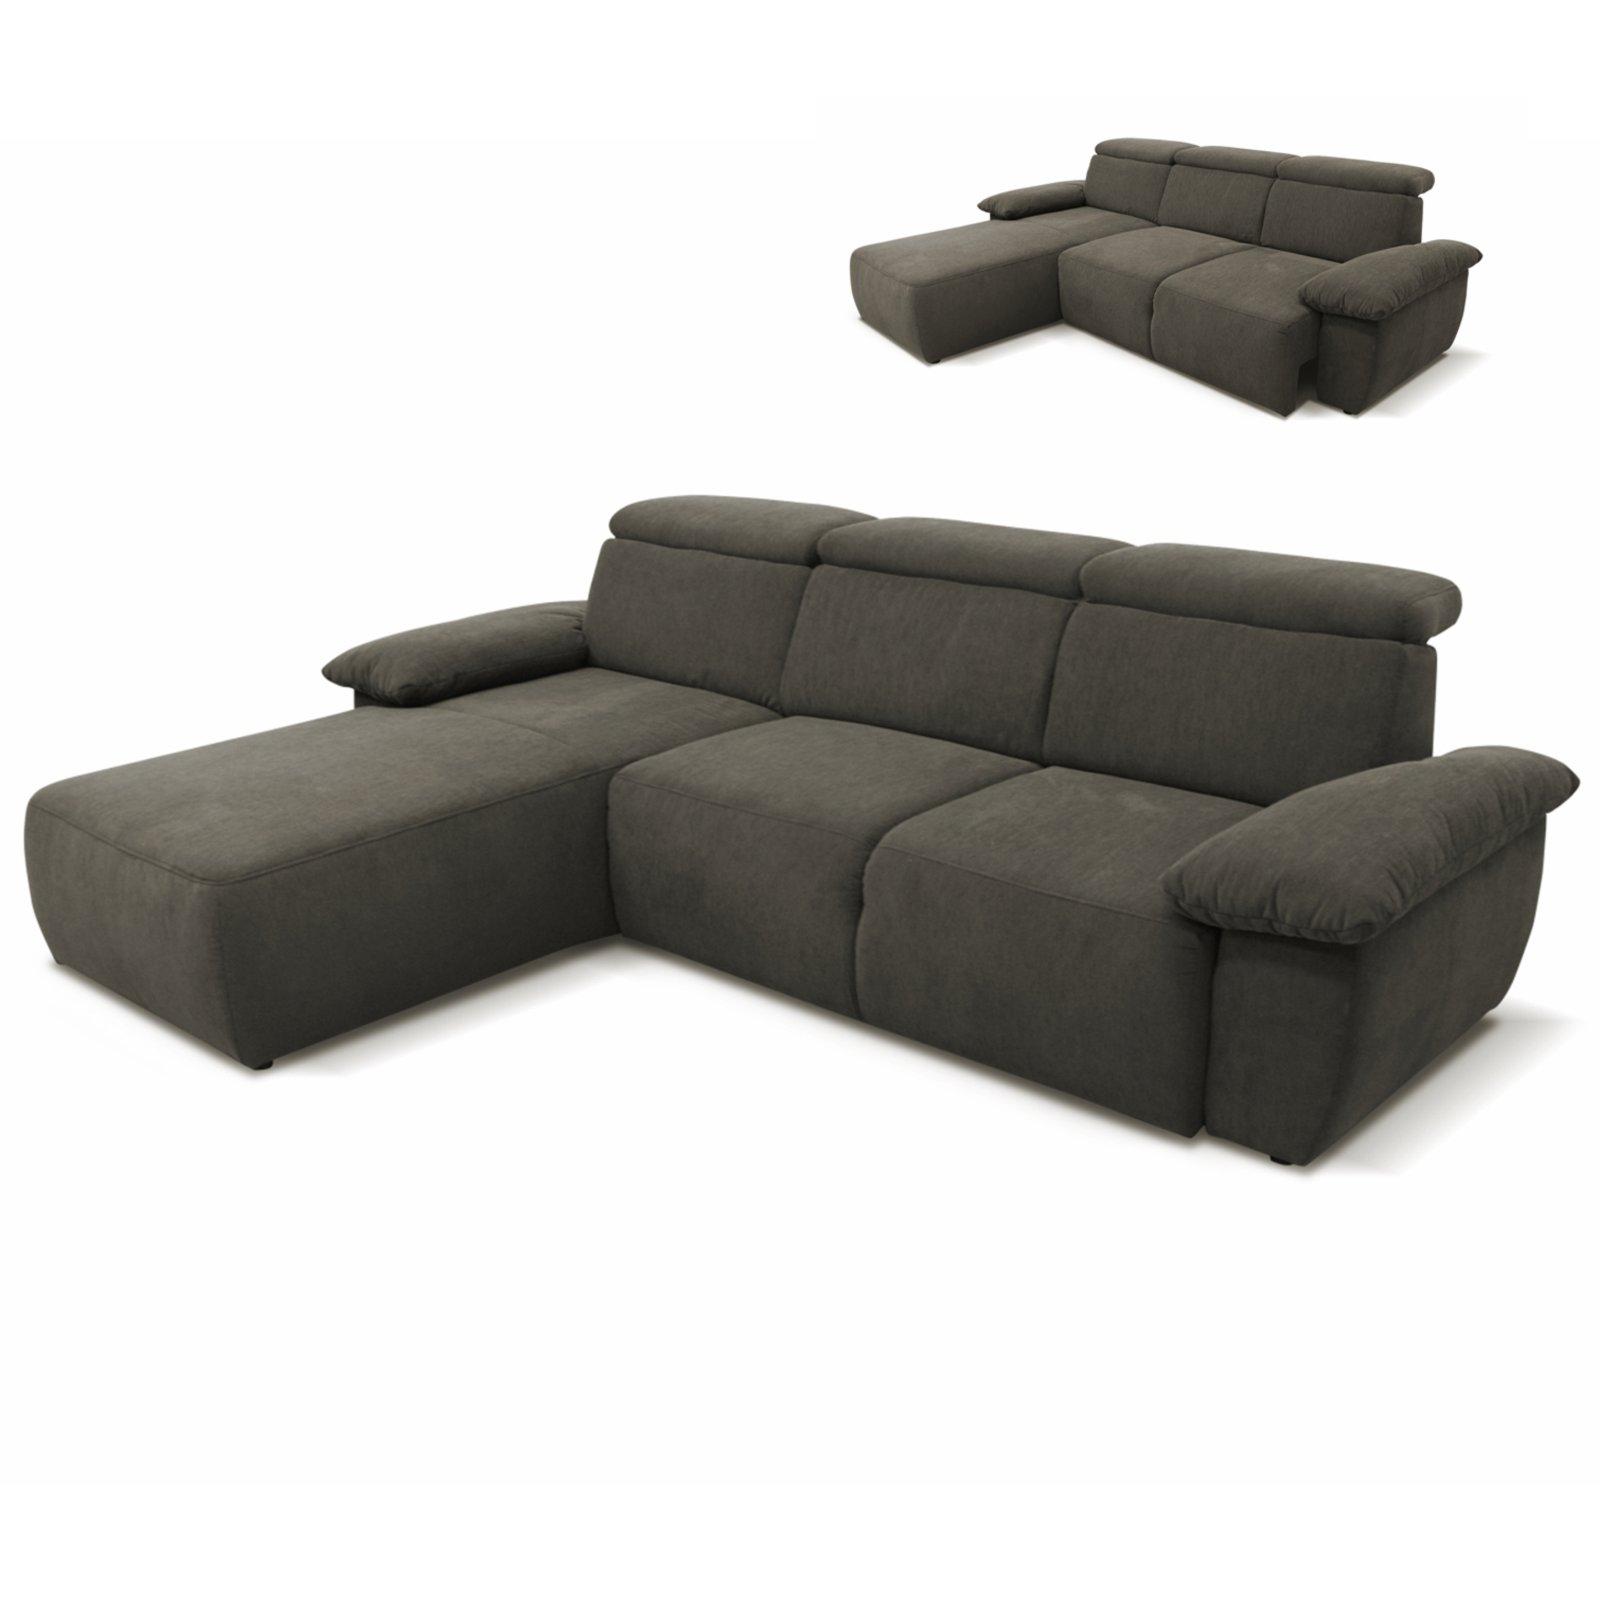 Www Roller De Sofa – Zuhause Image Idee